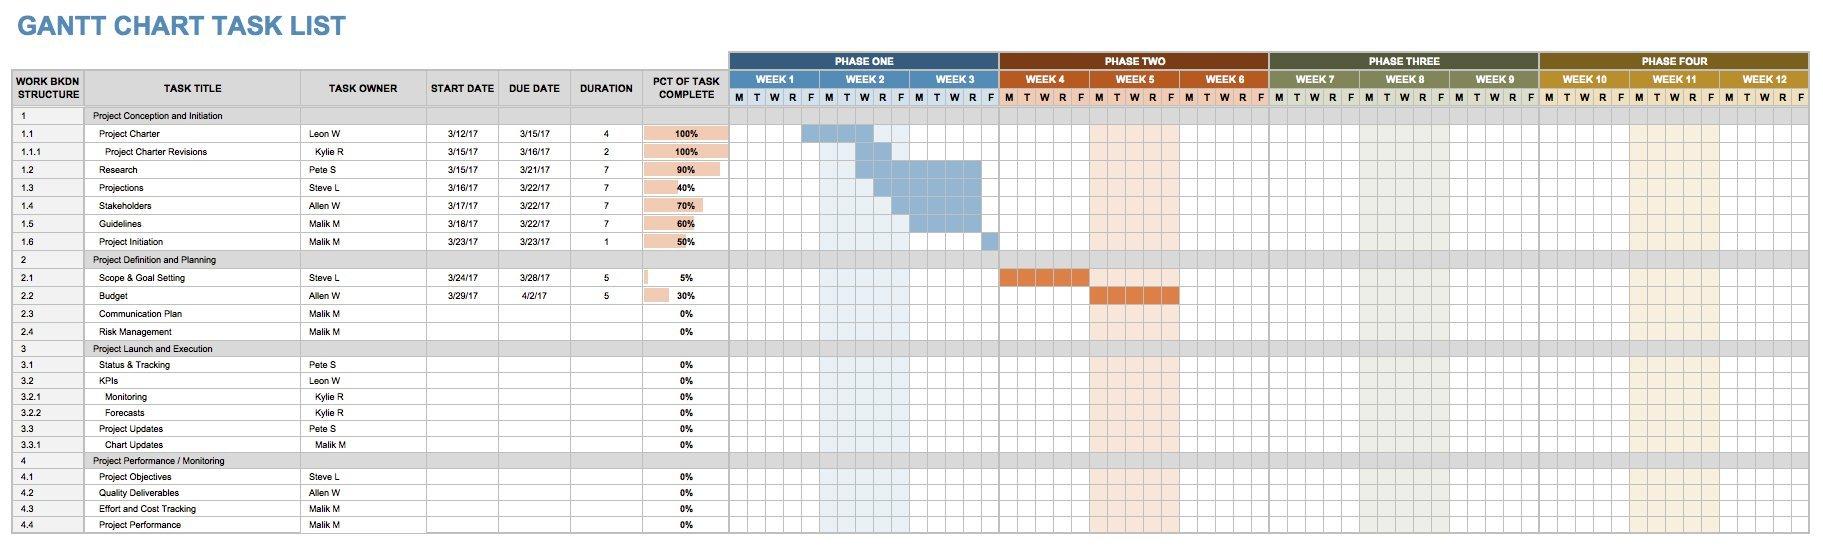 009 Template Ideas Temp Ganttcharttasklist Task List Wonderful Excel In Task Worksheet Template